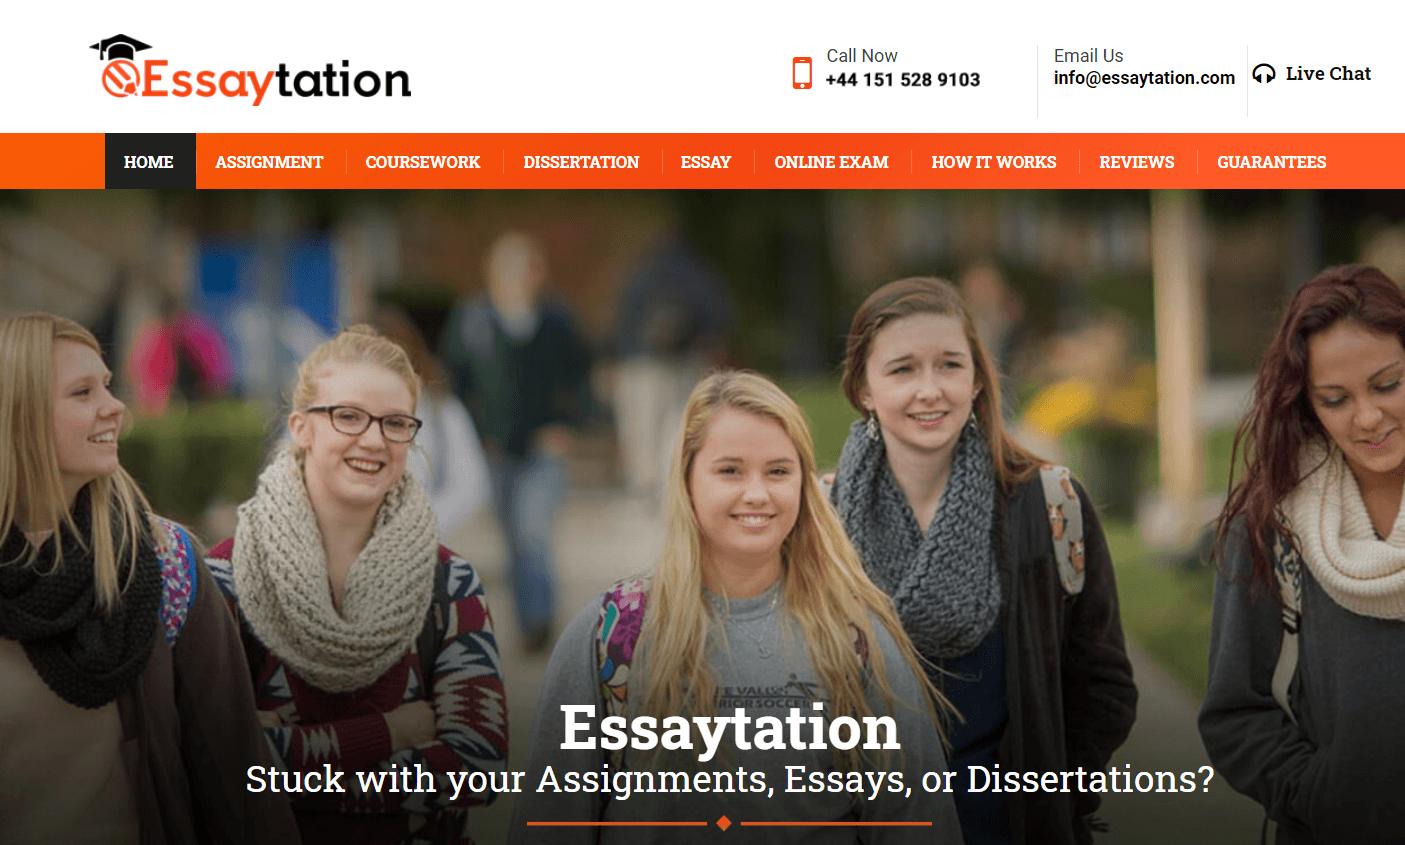 essaytation.com